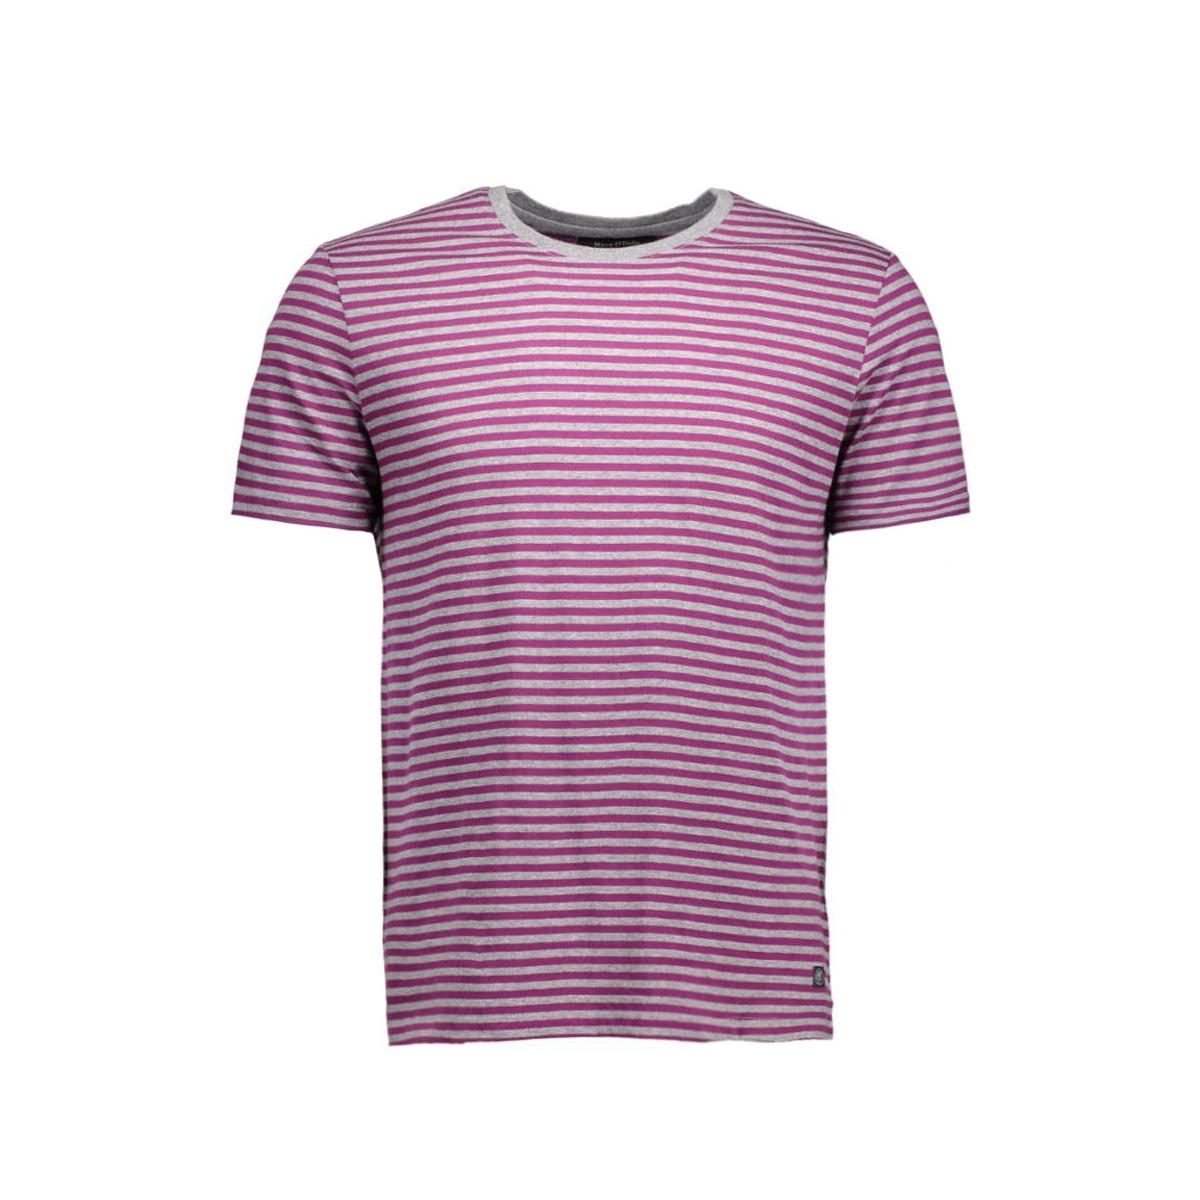 626 2156 51110 marc o`polo t-shirt 386 magenta purple